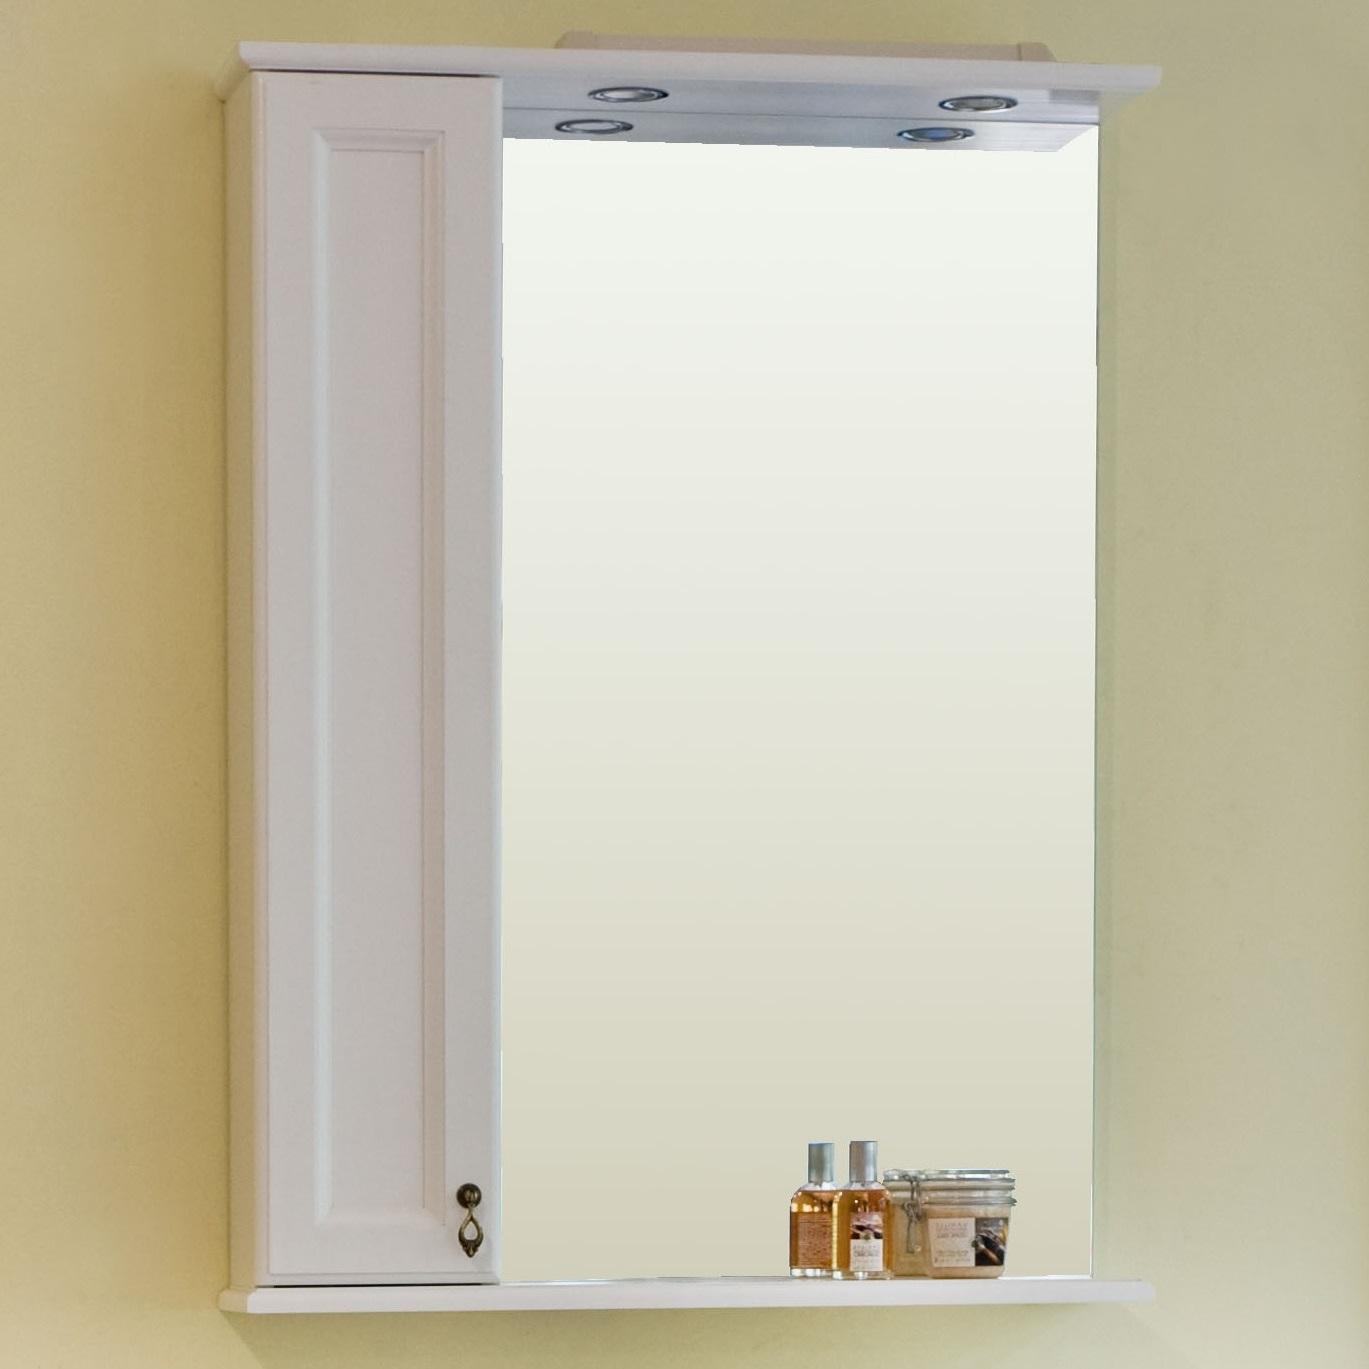 Зеркало Аллигатор МИЛАНА 2-75R/L, с подсветкой и шкафчиком, 75*18*99,5 см